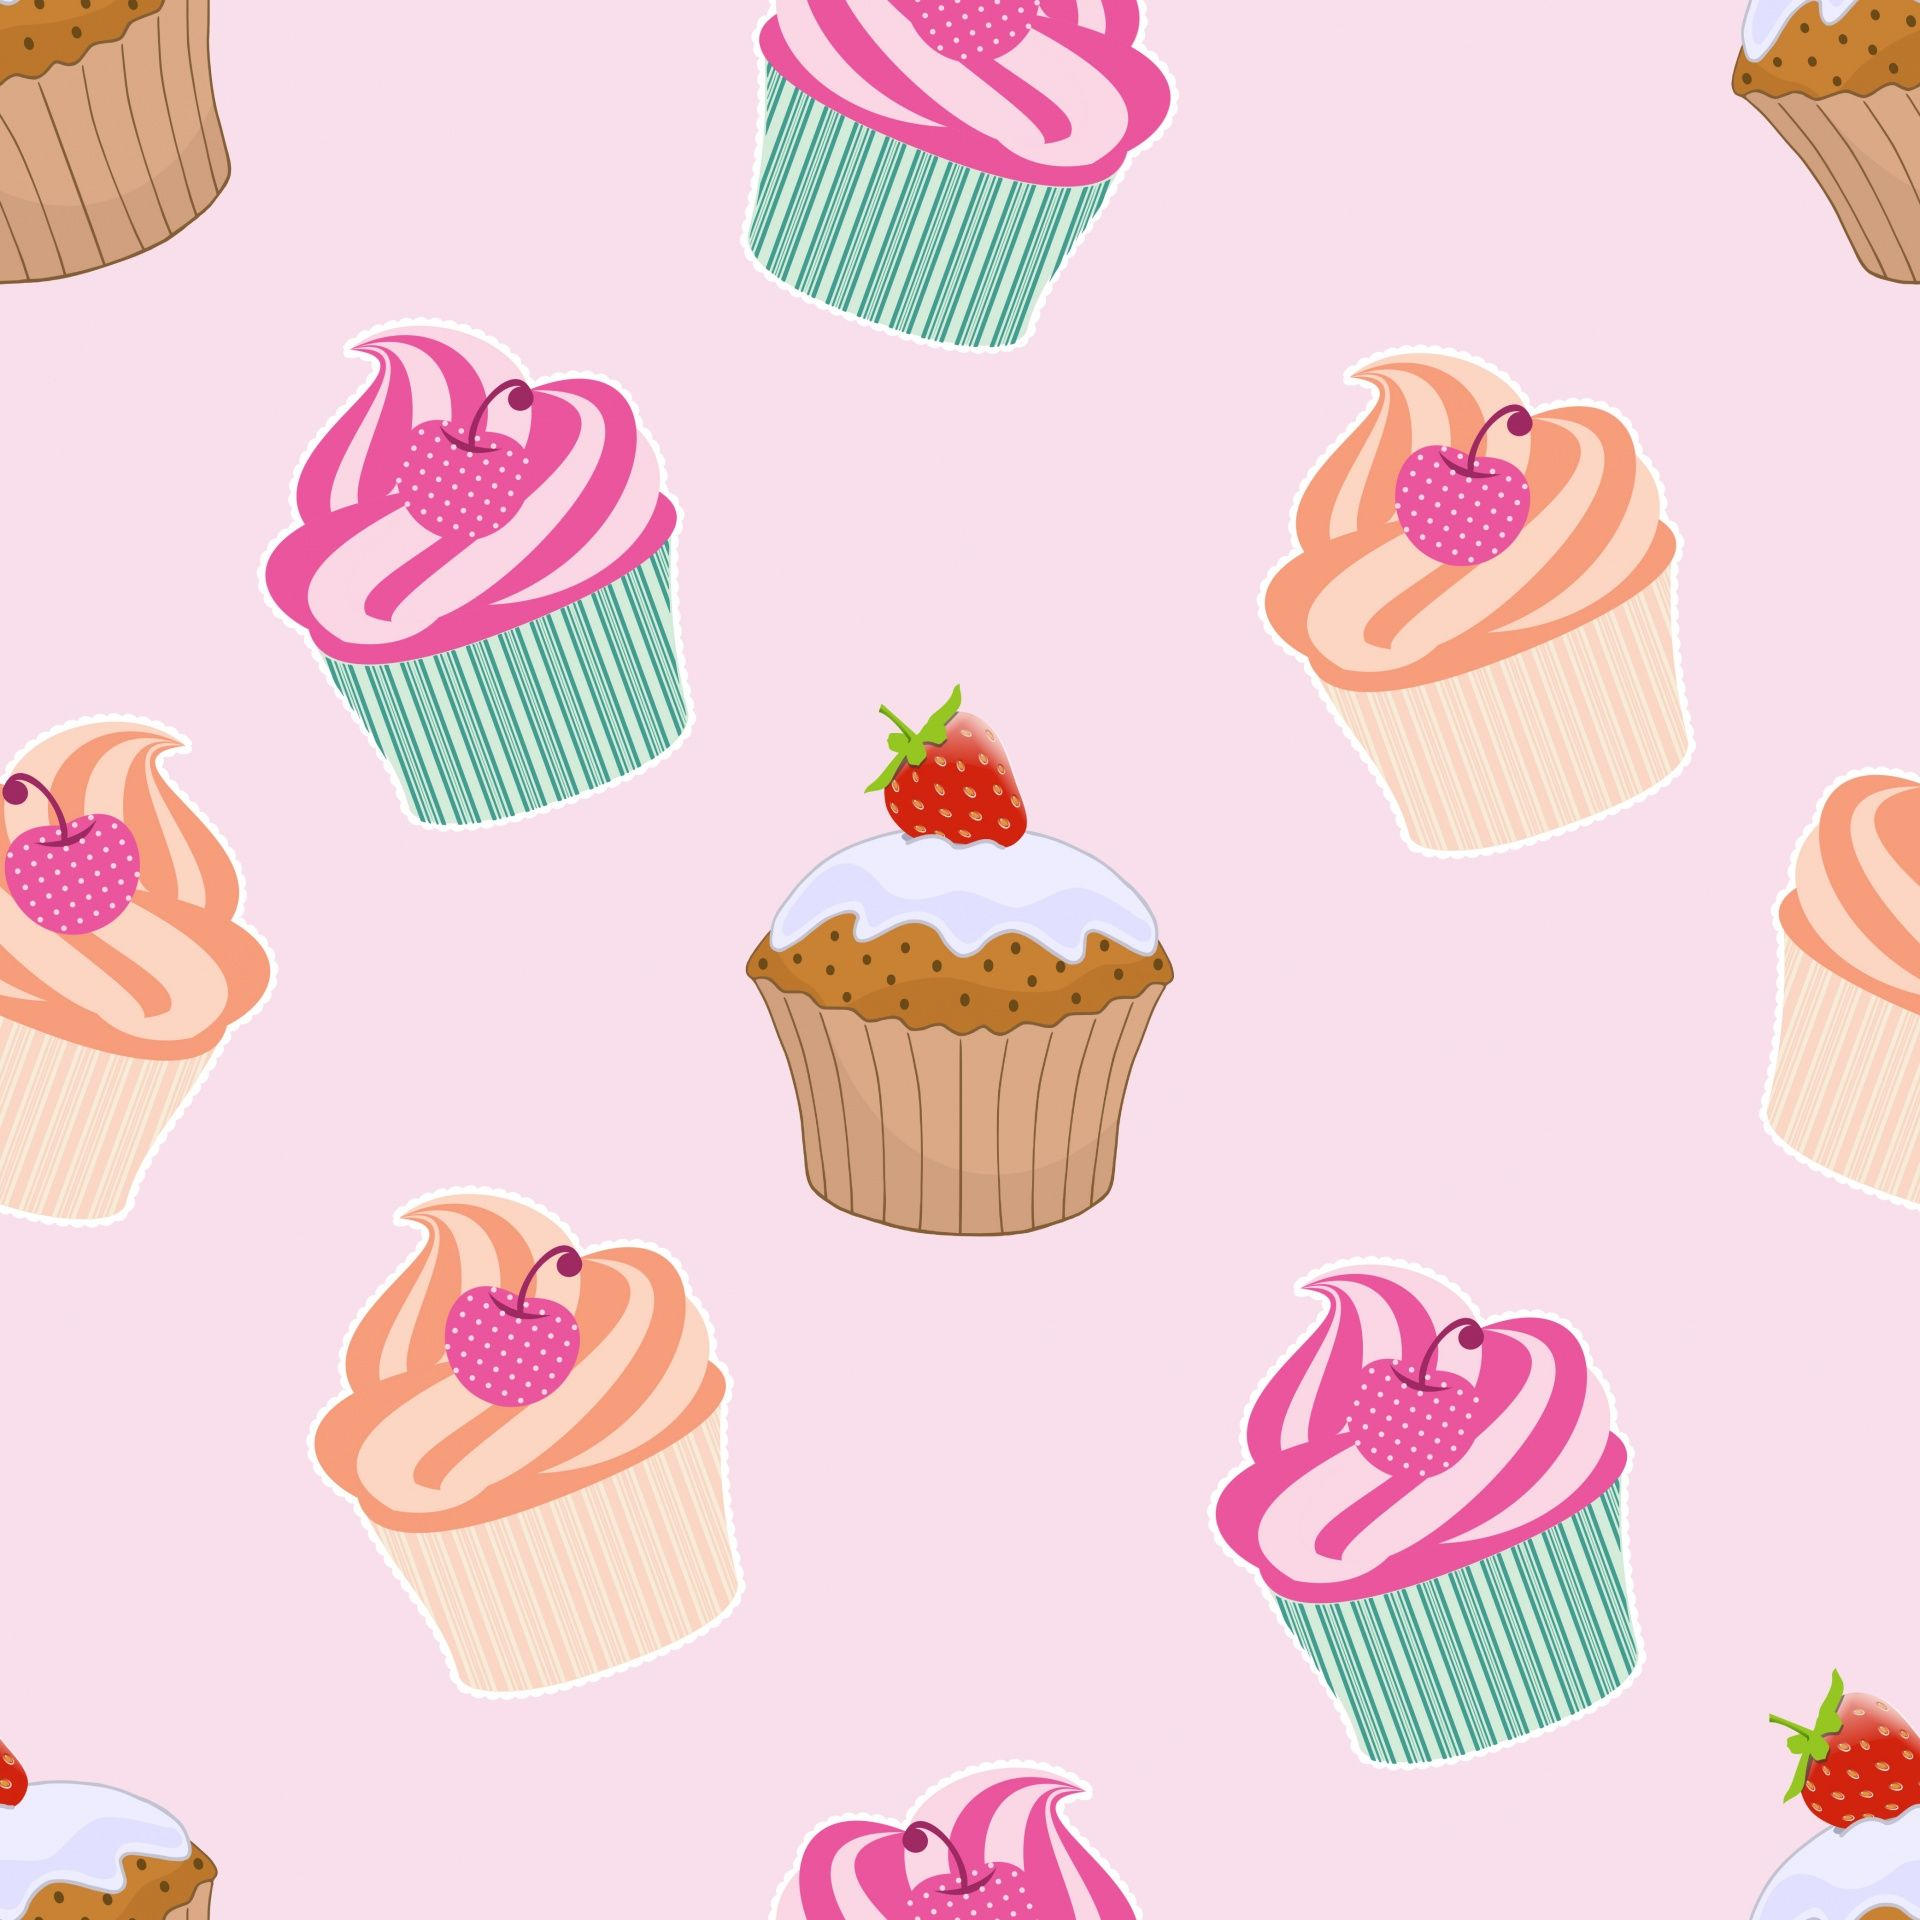 Cupcake Wallpaper – How to Make Good Cupcake Wallpaper?